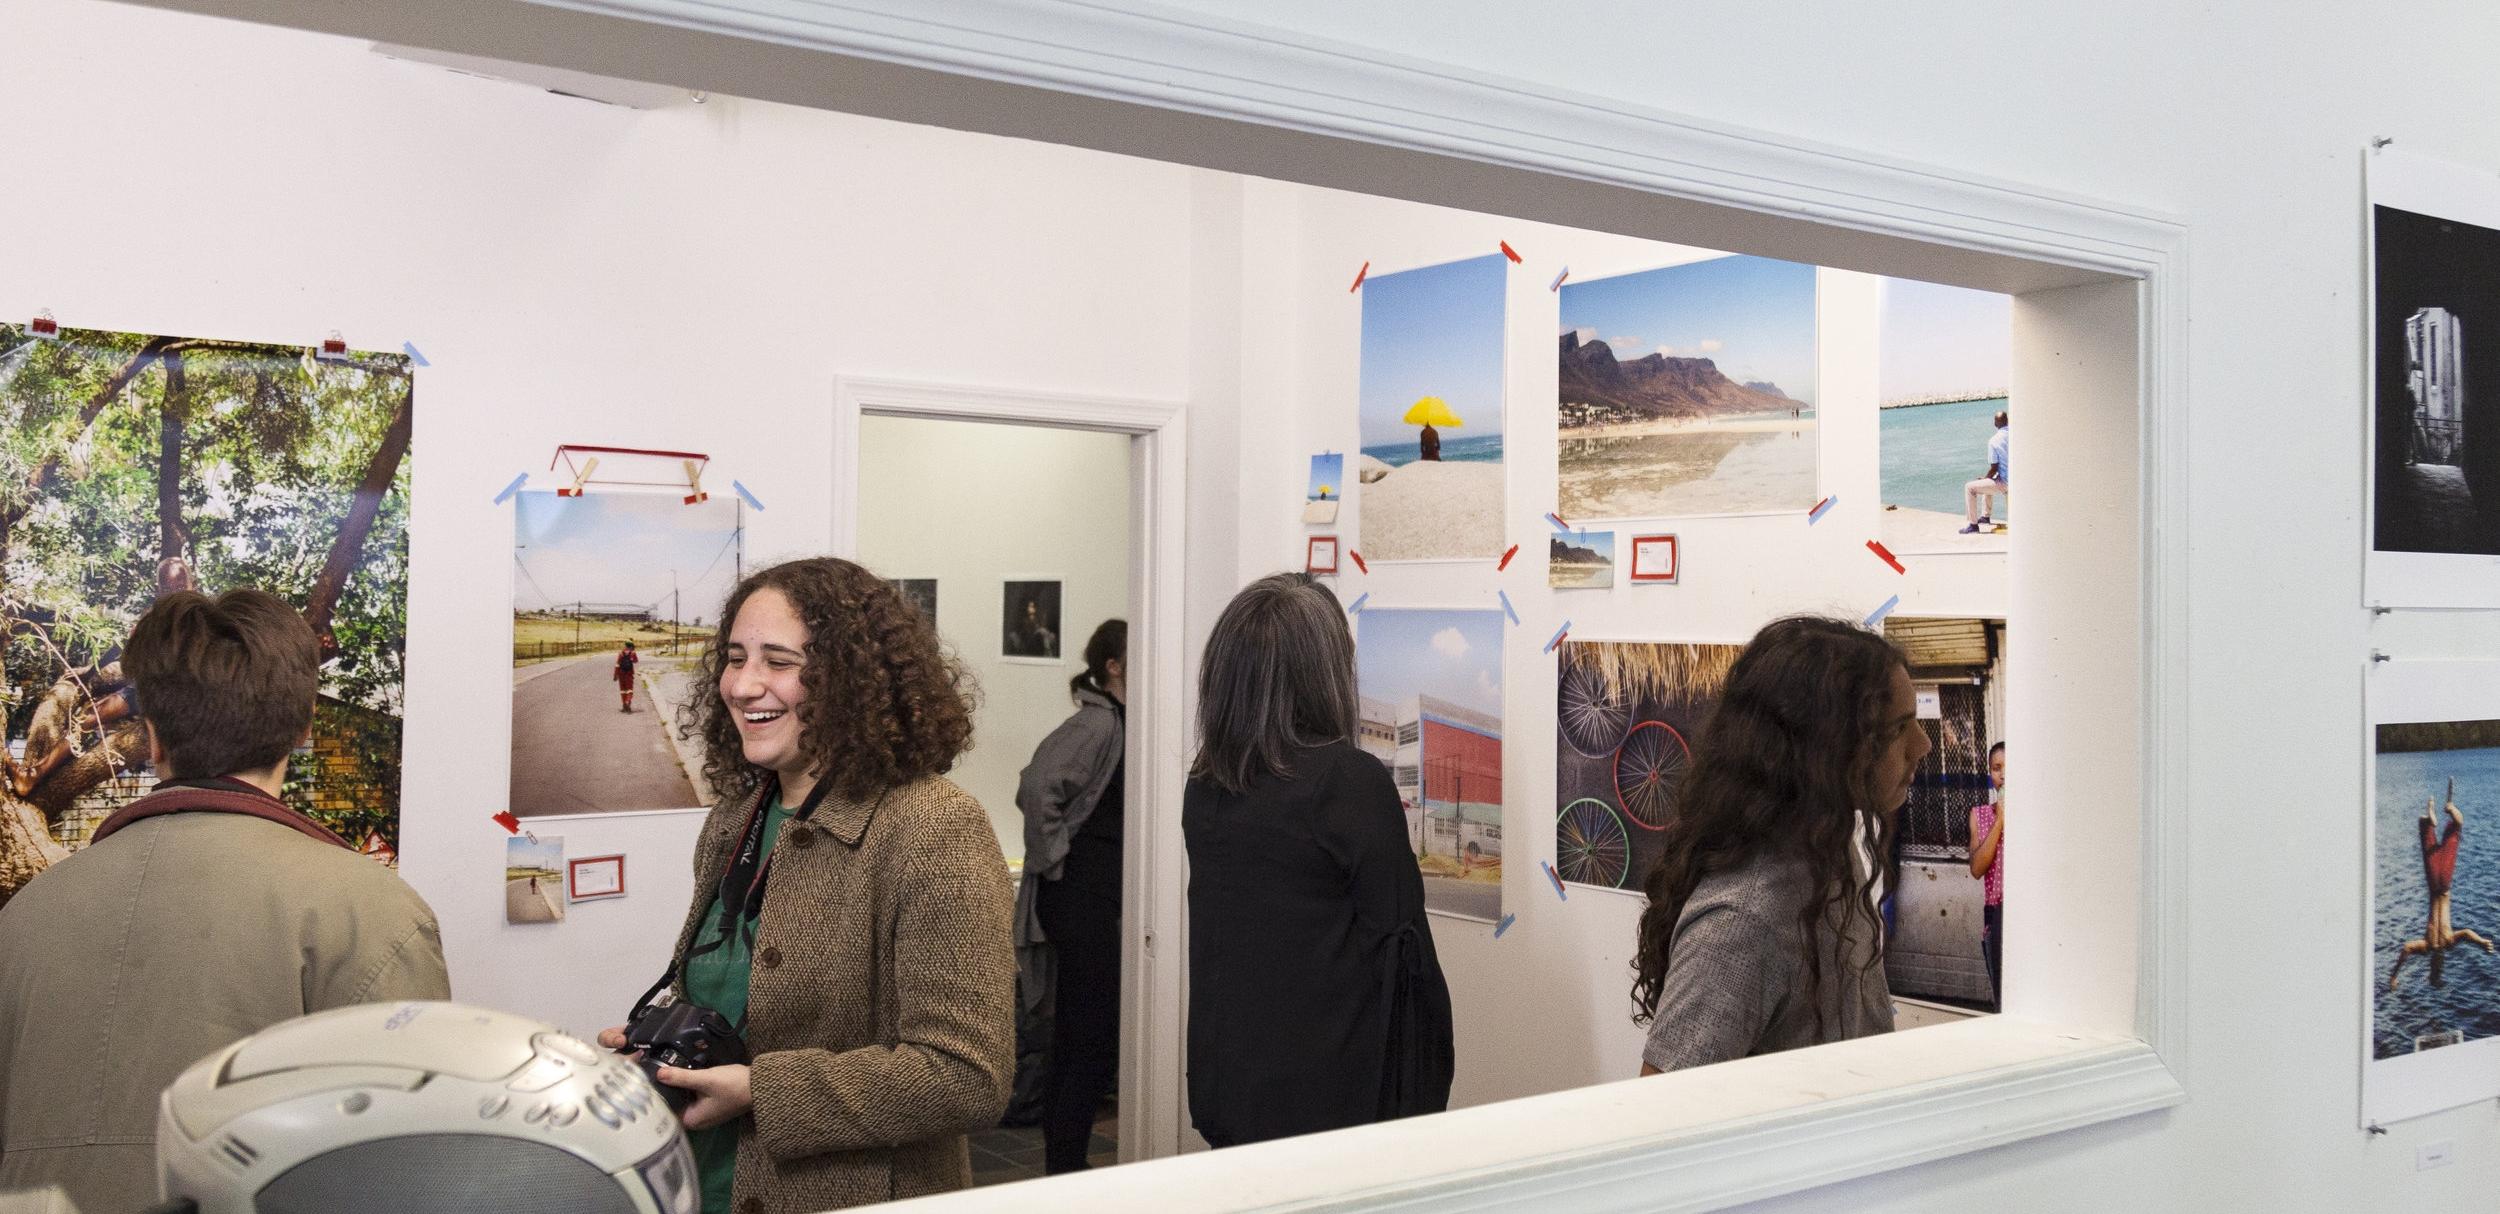 Scott Foley's exhibit